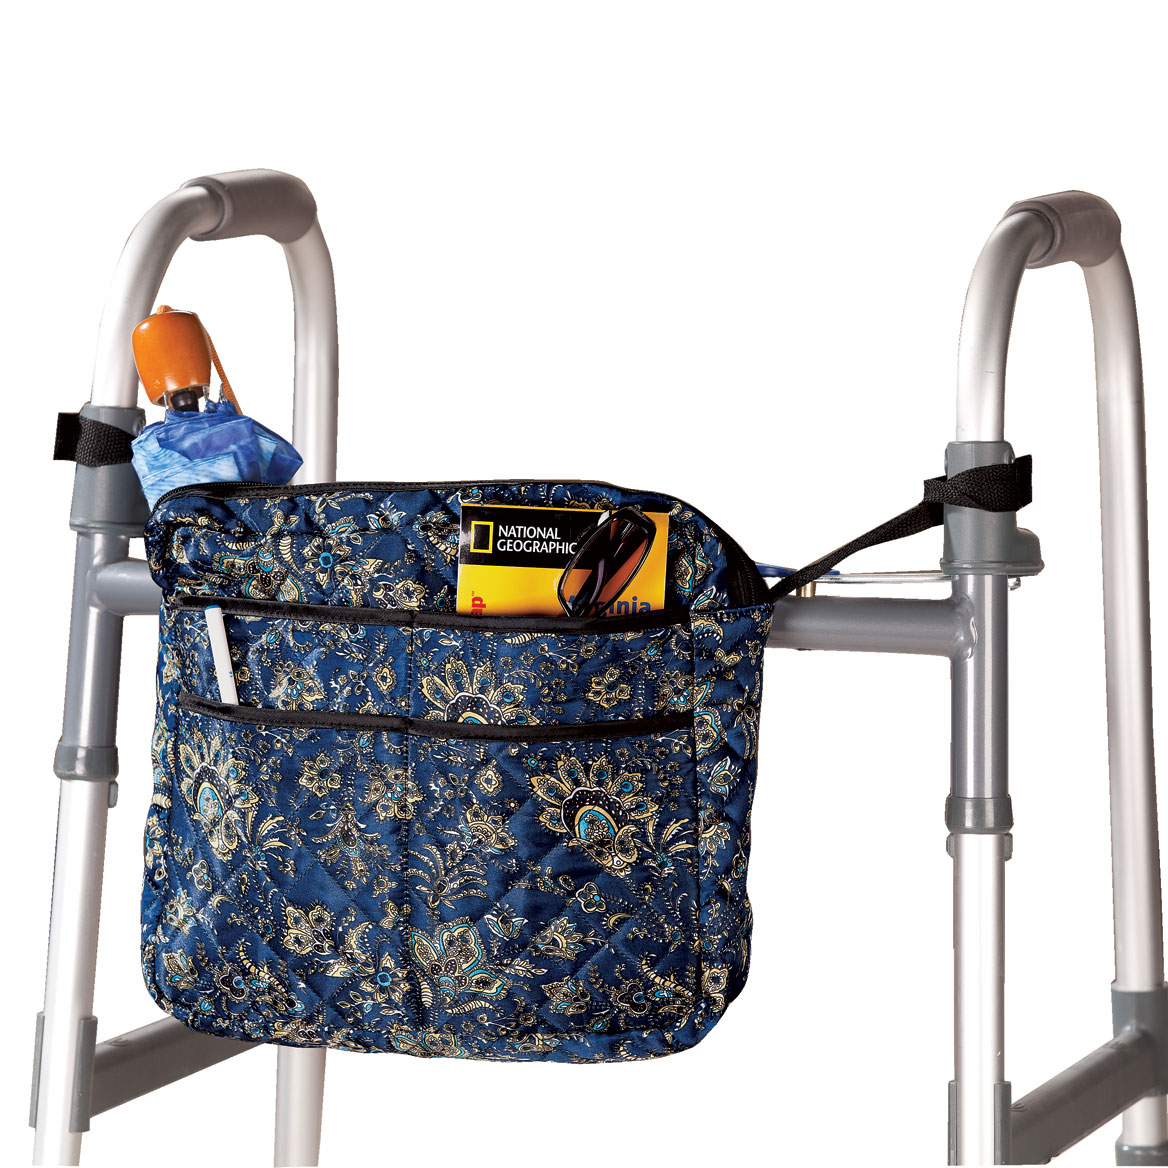 Walker/Wheelchair Bag